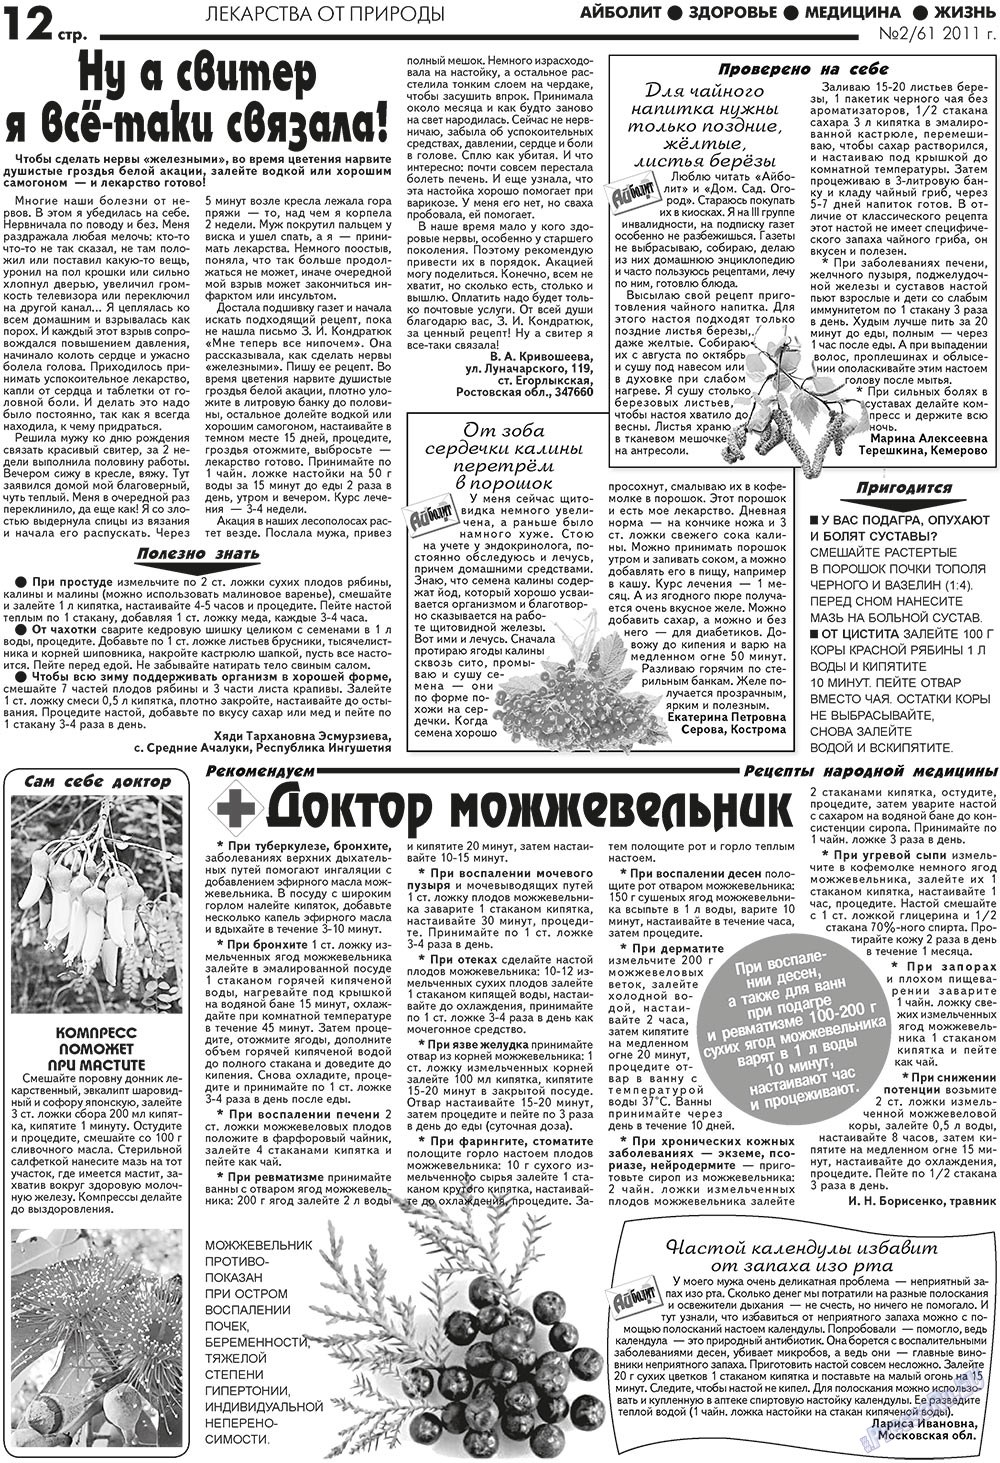 АйБолит (газета). 2011 год, номер 2, стр. 12